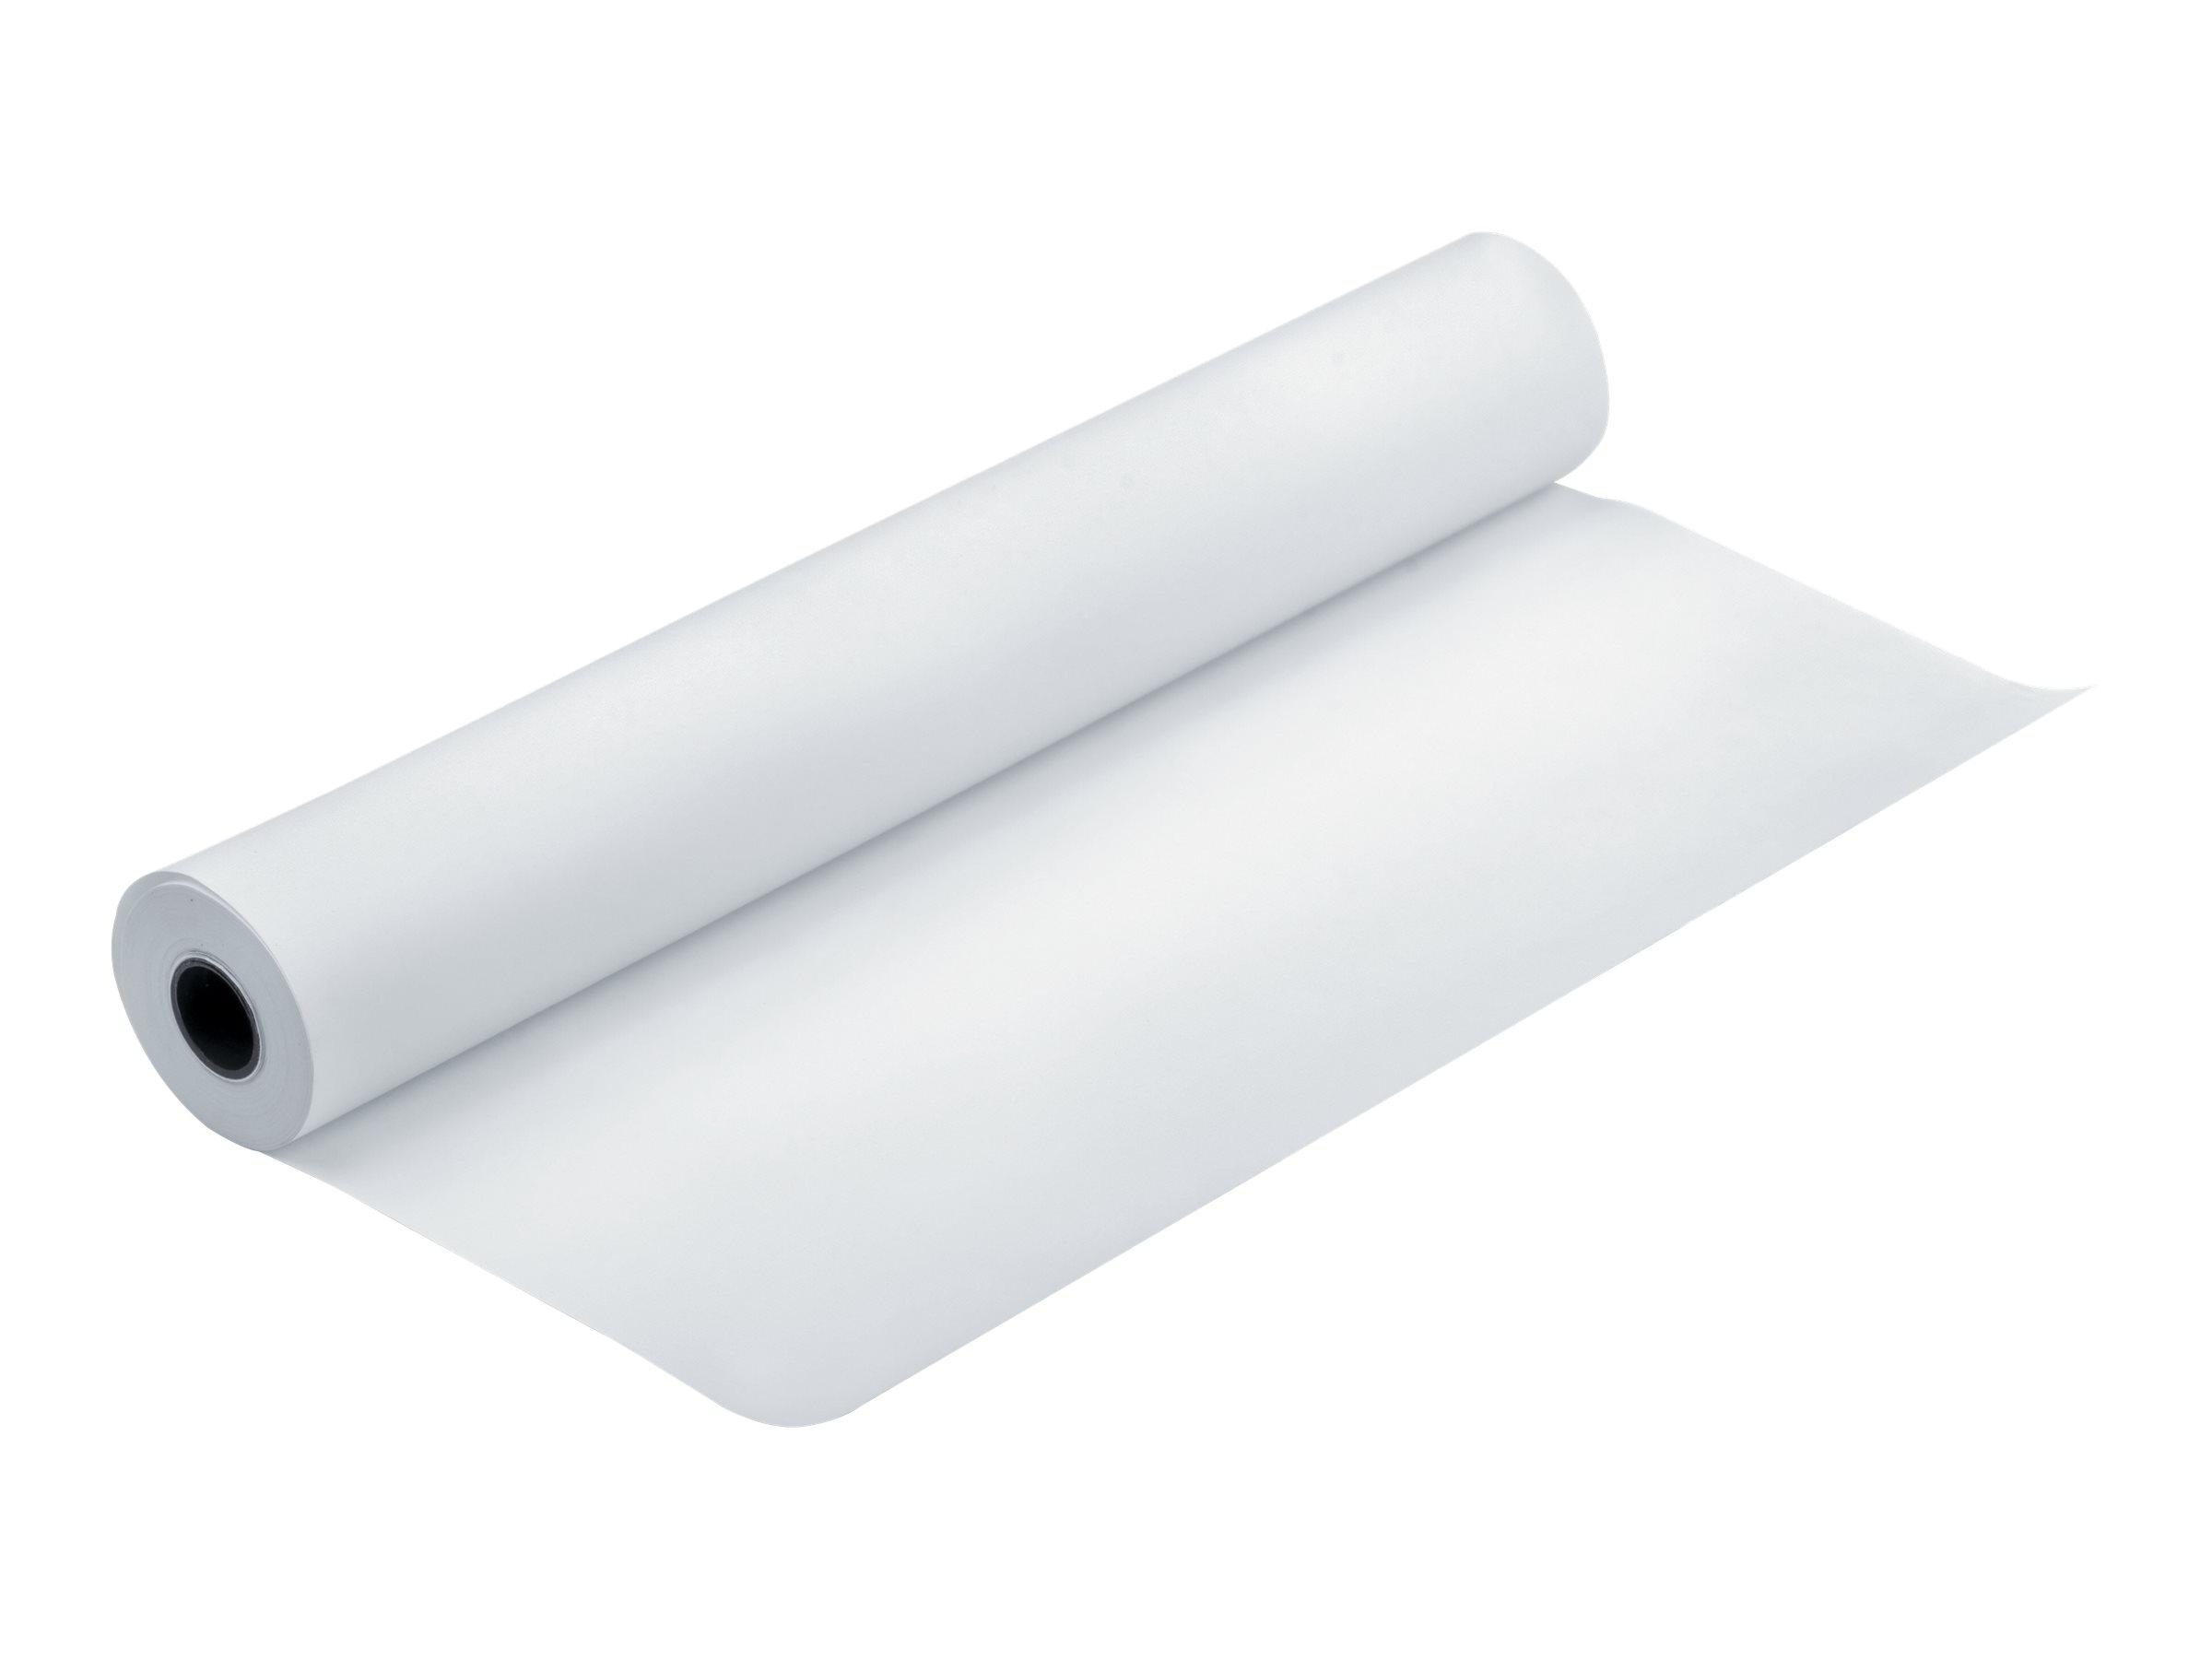 Epson Premium Luster Photo Paper (260) - Glanz - Rolle (152,4 cm x 30,5 m) 1 Rolle(n) Fotopapier - für Stylus Pro 11880, Pro 118